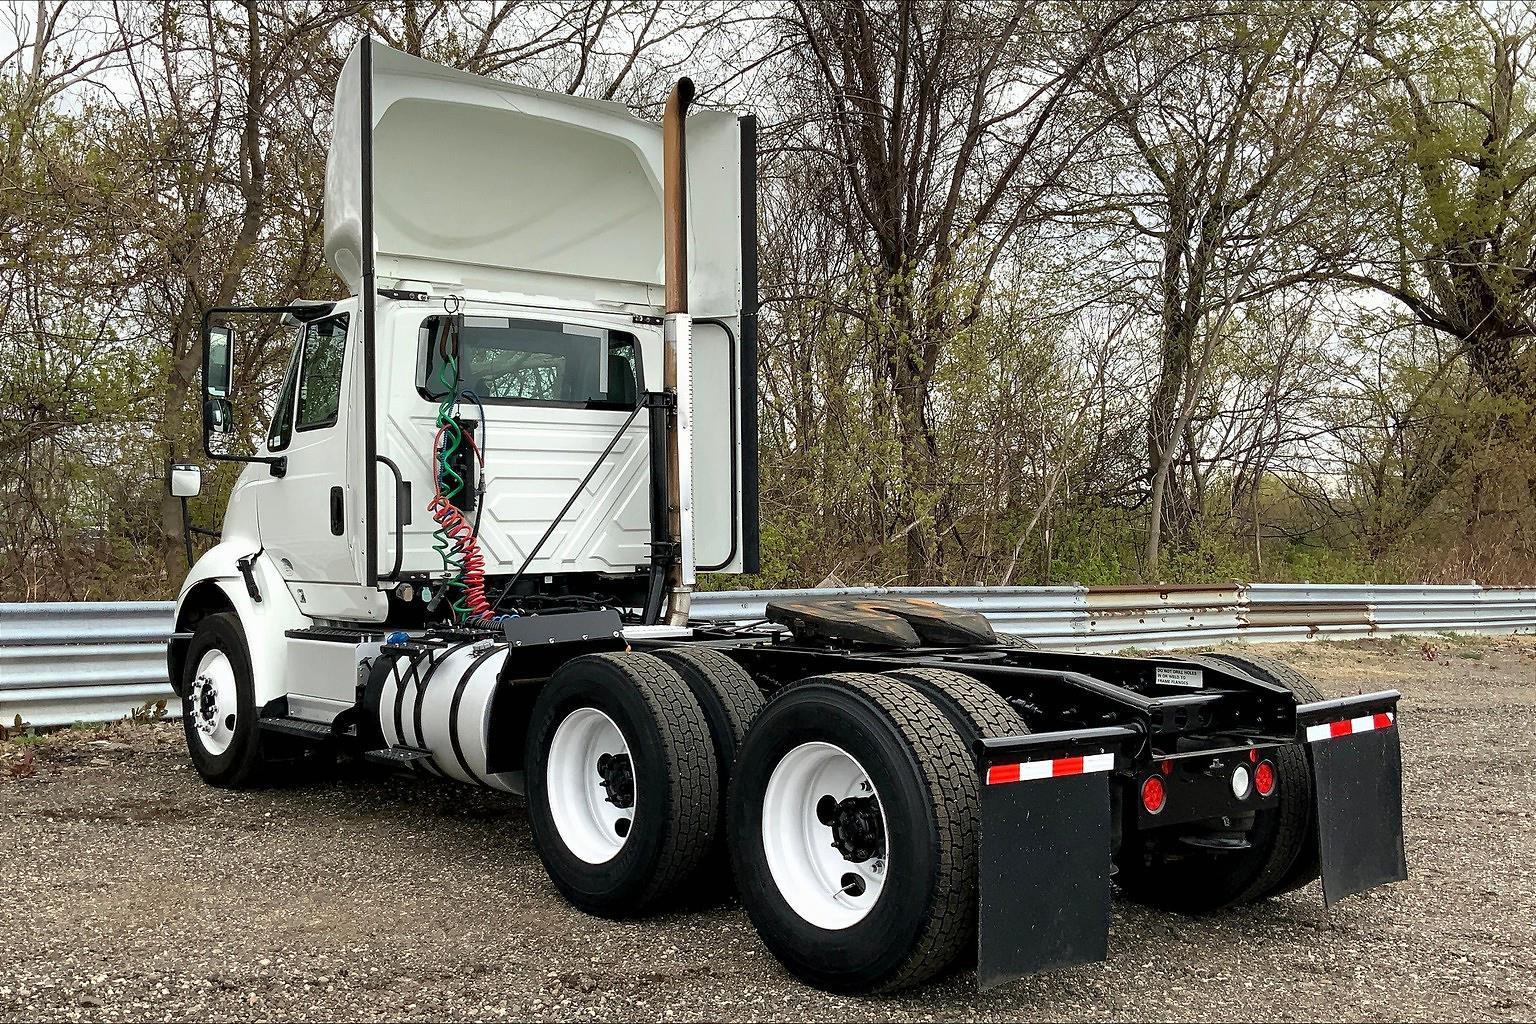 2016 International TranStar 8600 6x4, Tractor #GN004950 - photo 1